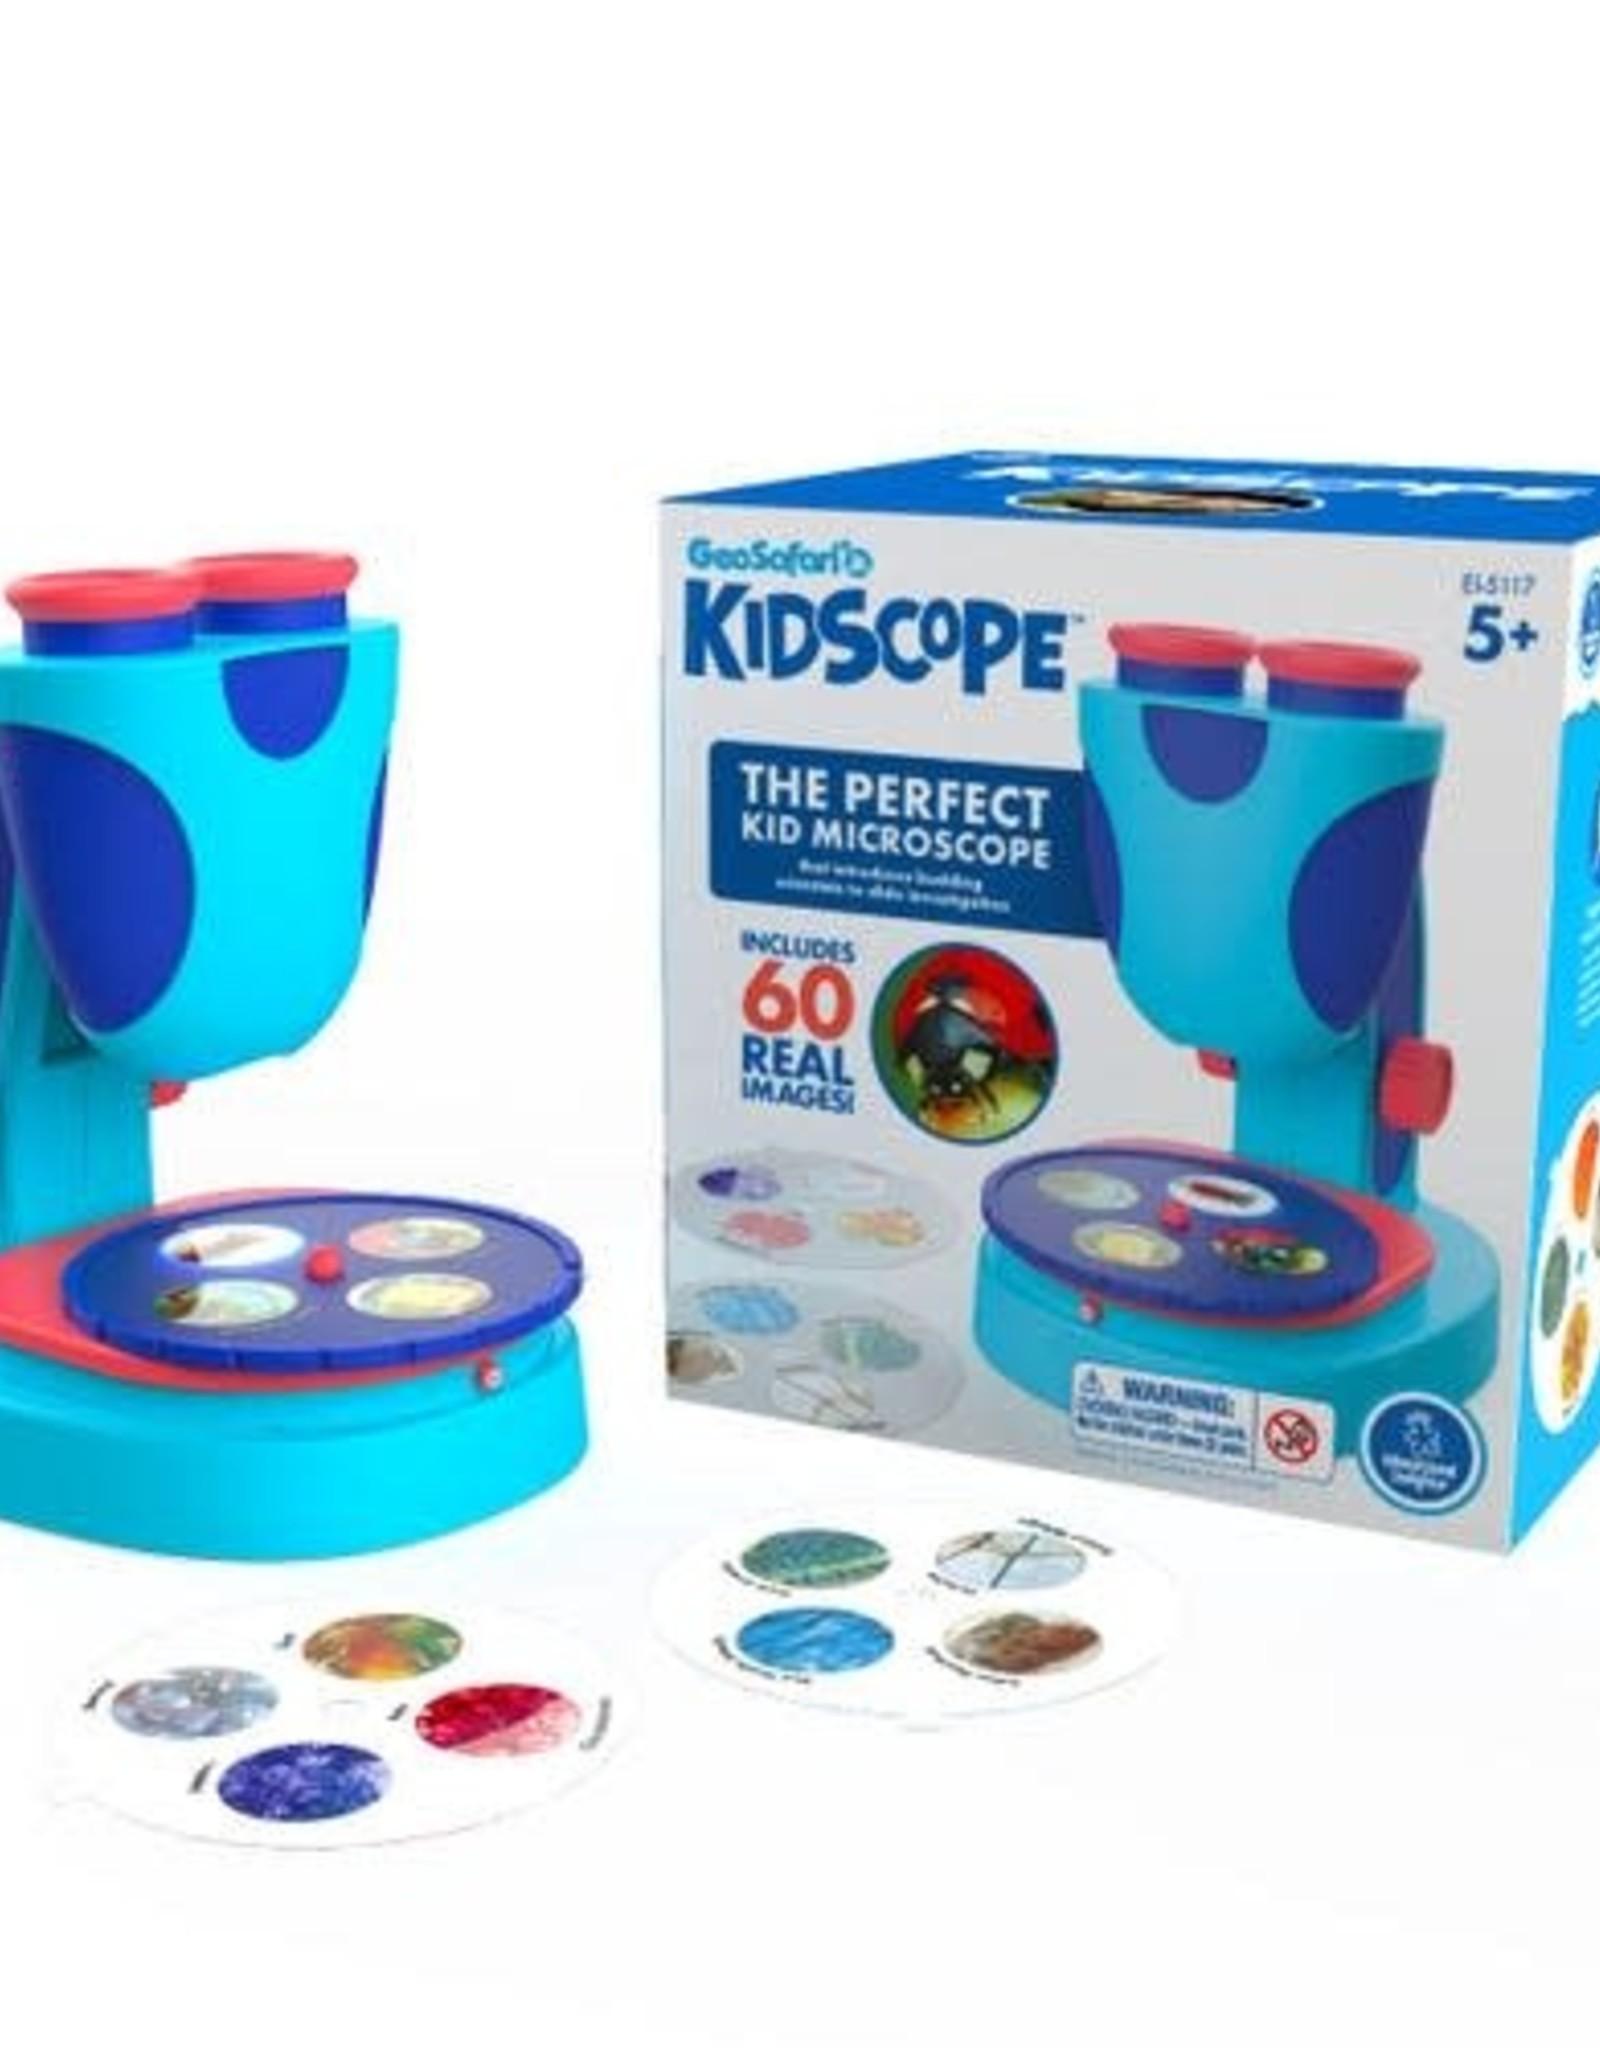 Educational Insights Geosafari Jr. Kidscope